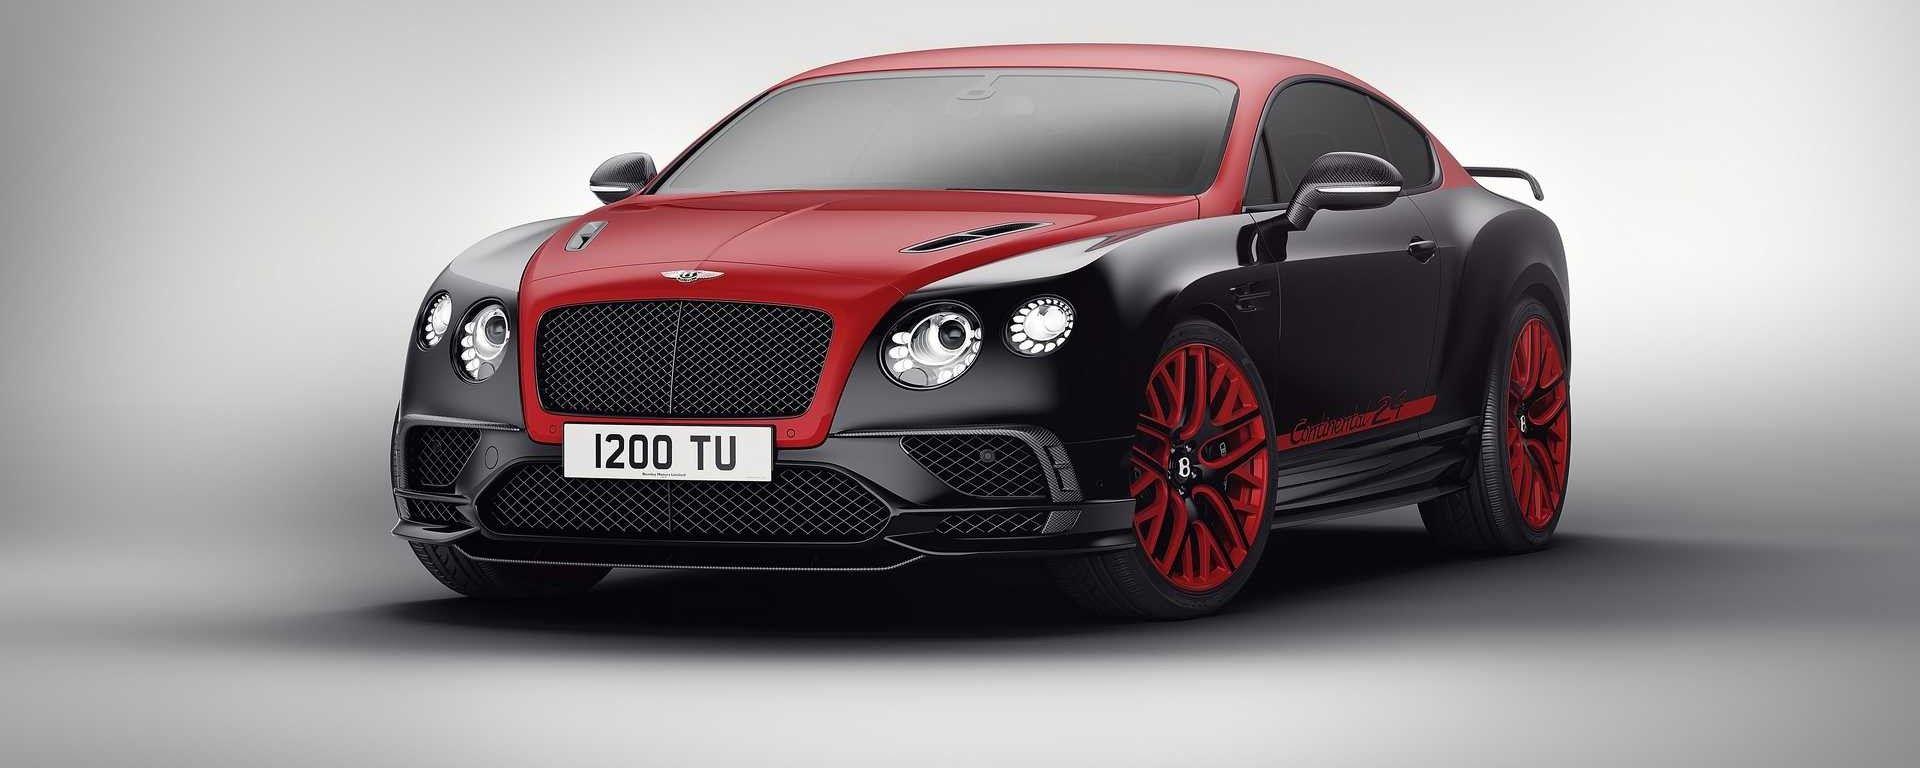 Bentley Continental 24 Edition: d'ispirazione motorsport